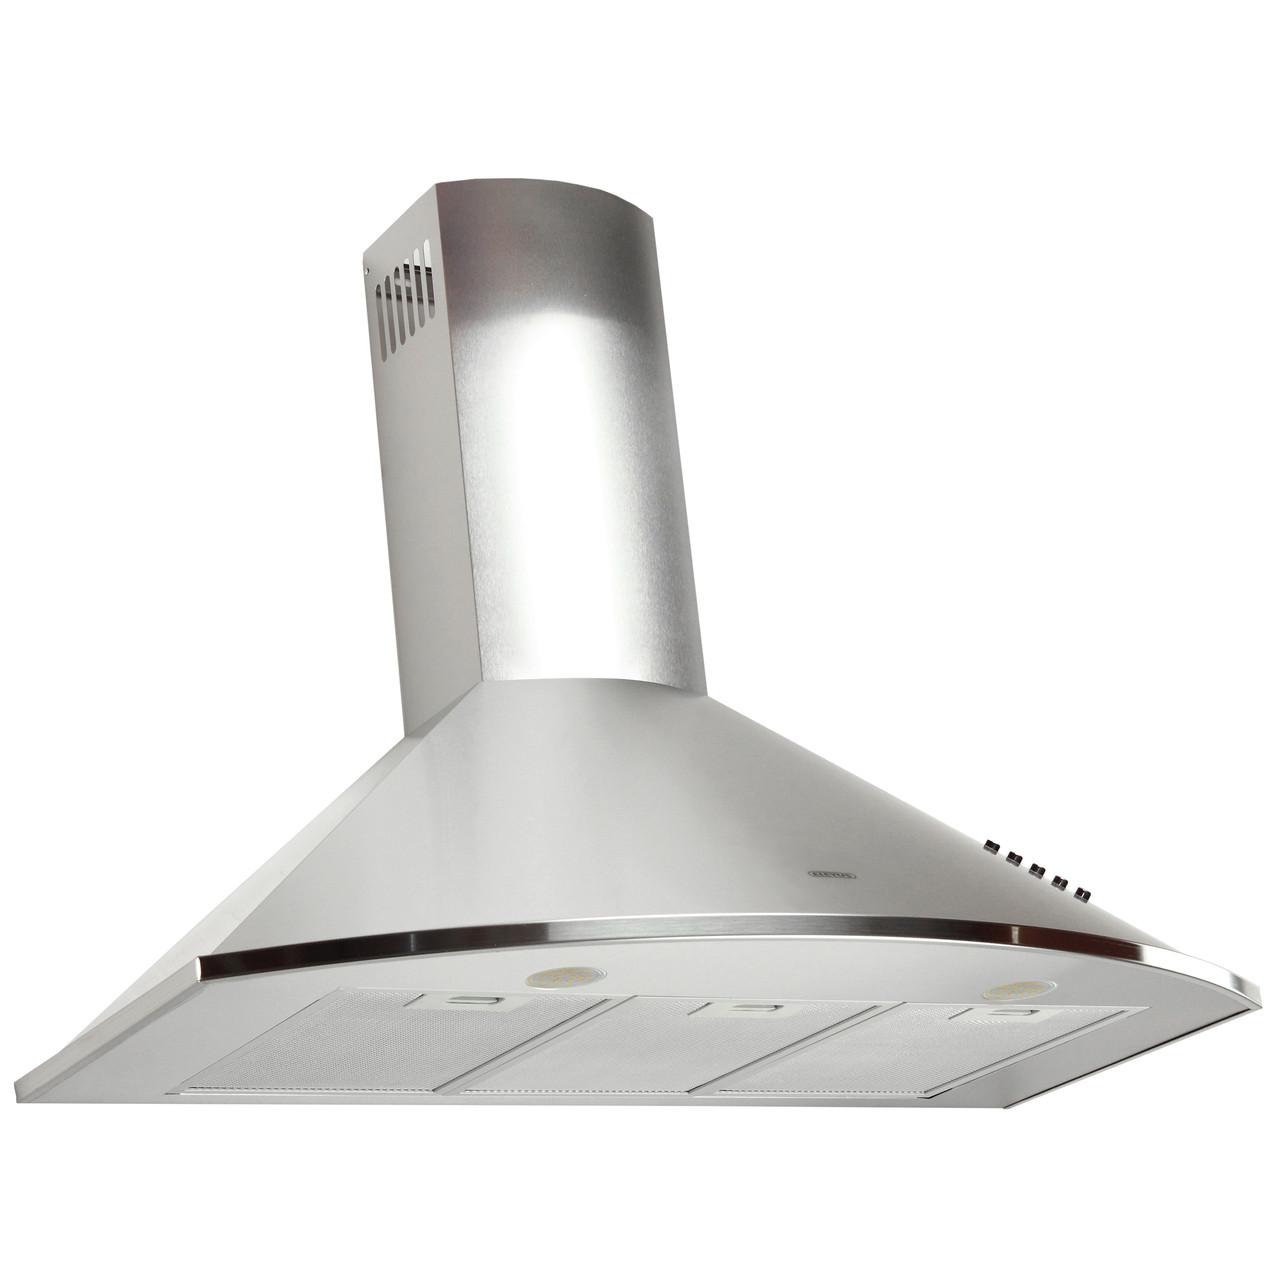 Витяжка кухонна ELEYUS Bora 1000 LED SMD 90 IS